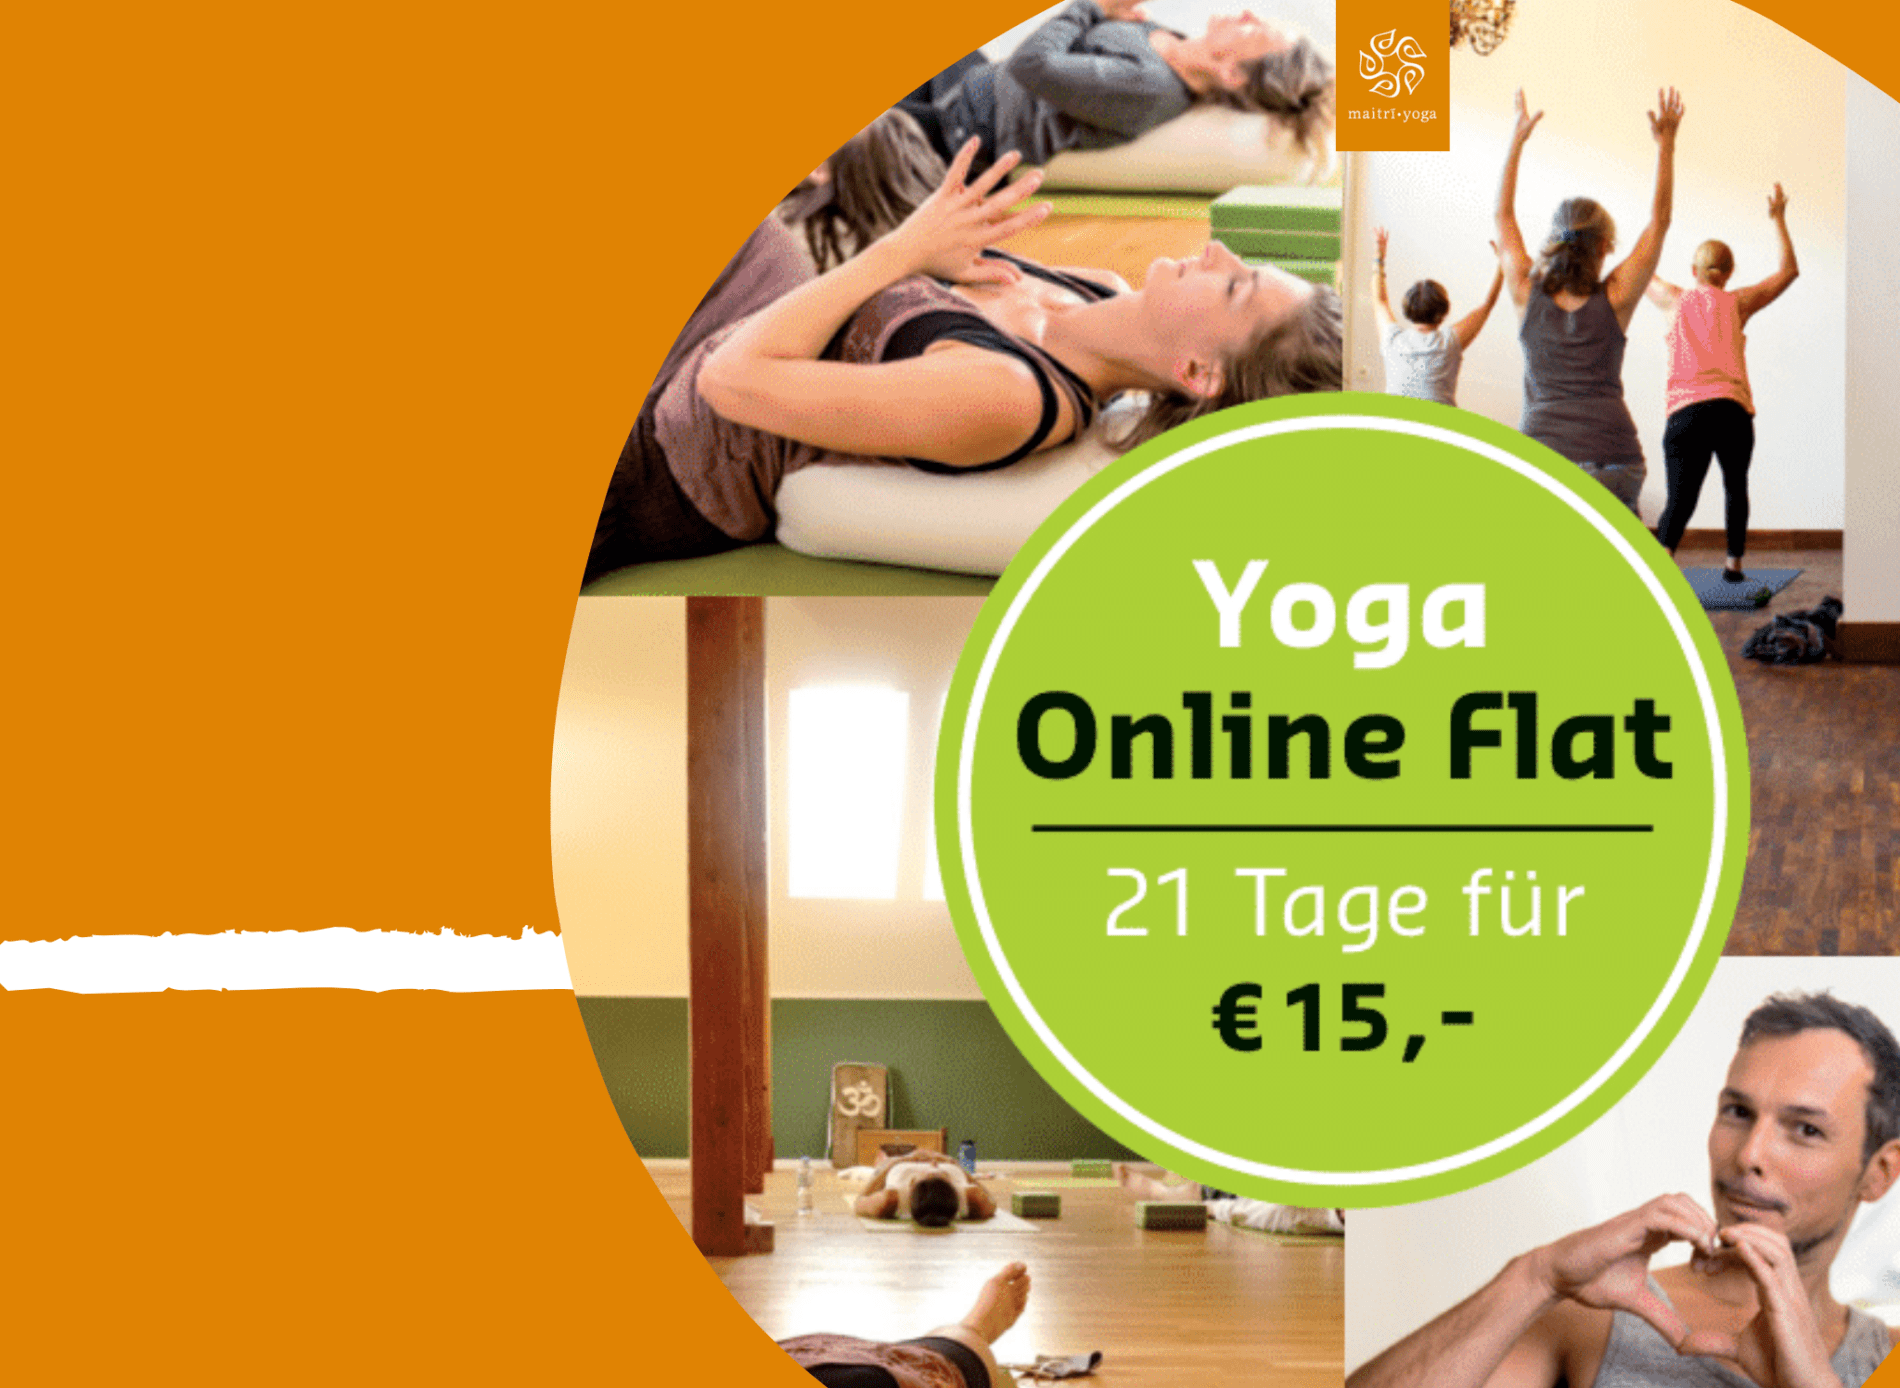 Online Yoga Flat